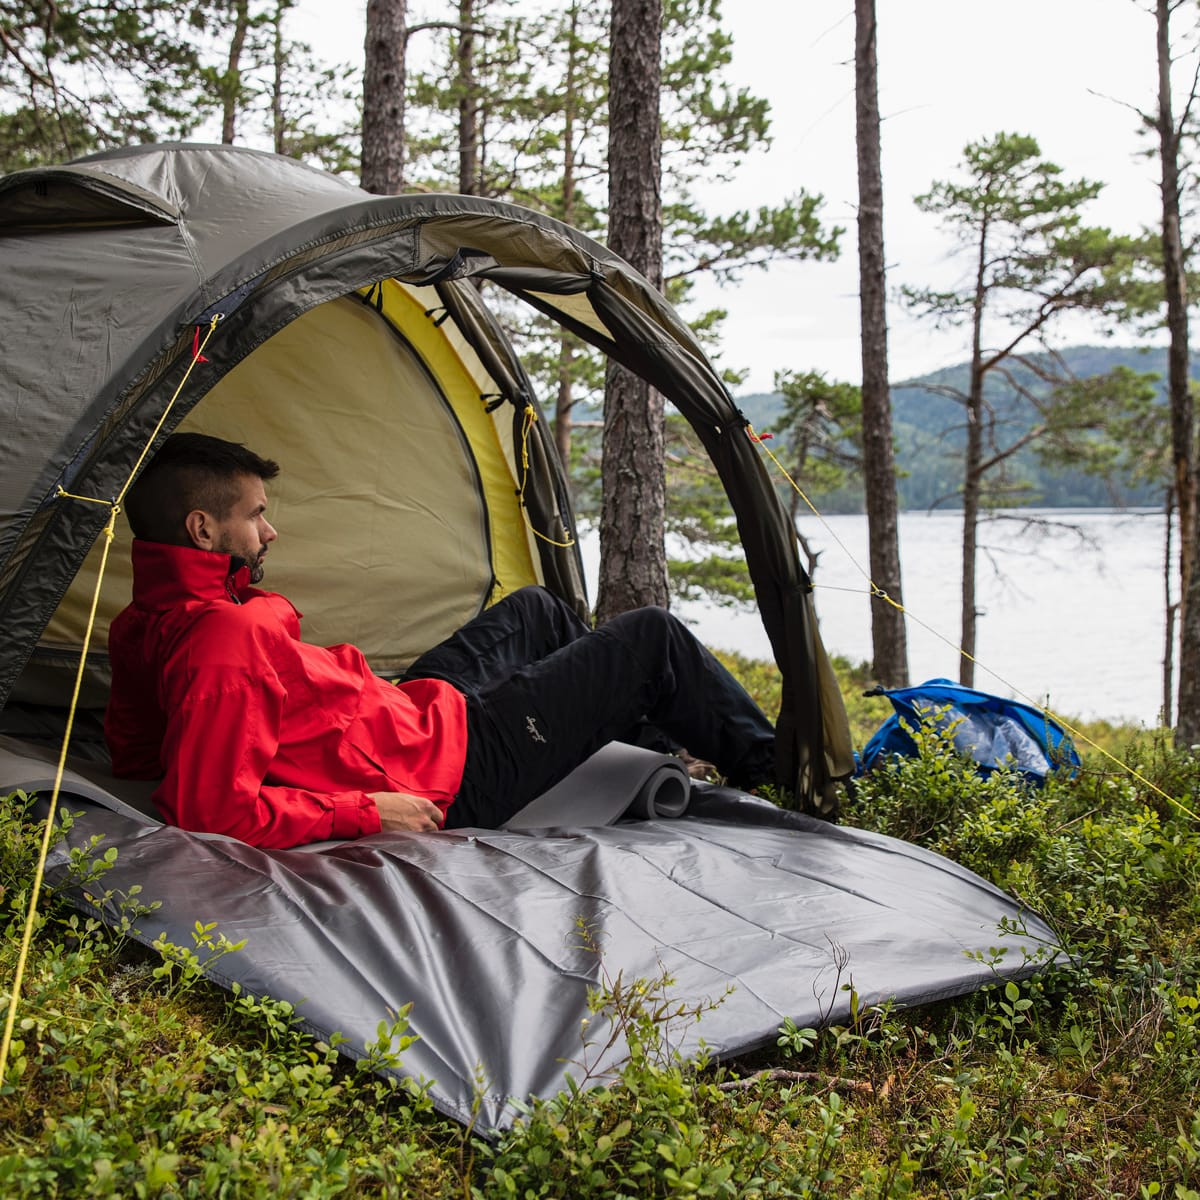 Helsport Footprint Lofoten ProSL 3 Camp Ekstern bunnduk for